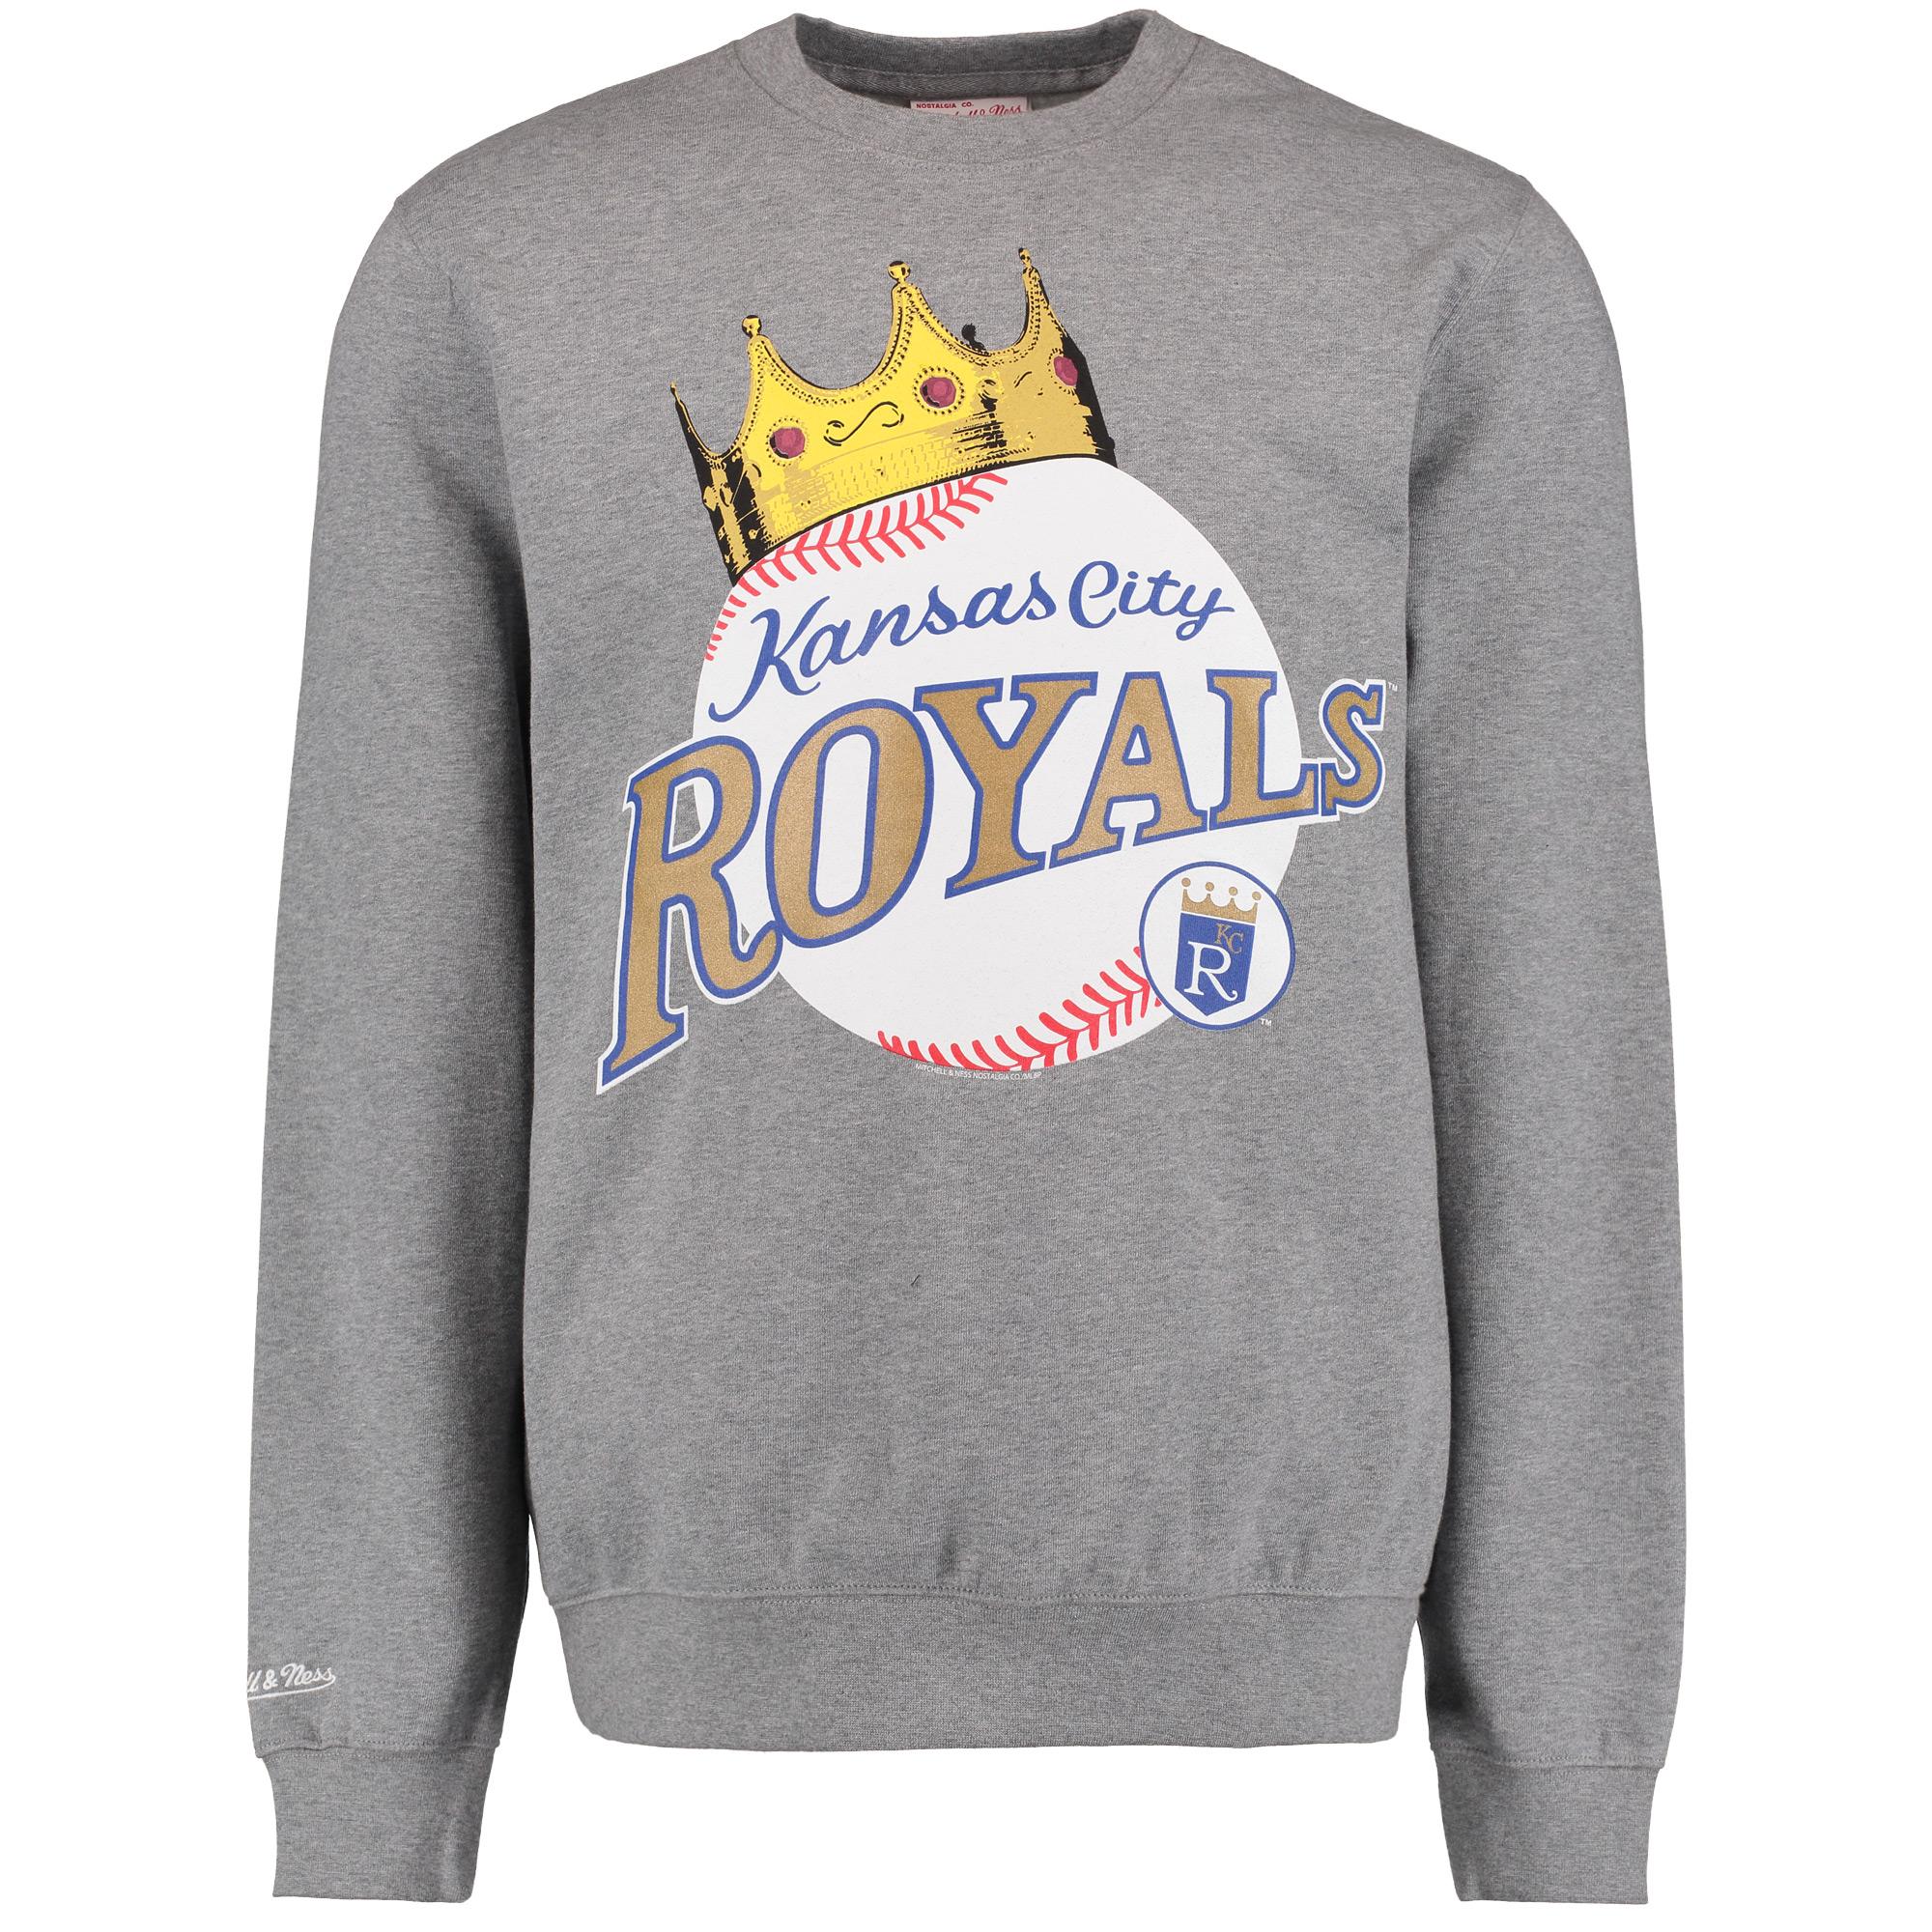 Kansas City Royals Mitchell & Ness Crewneck Fleece Pullover Sweatshirt - Gray